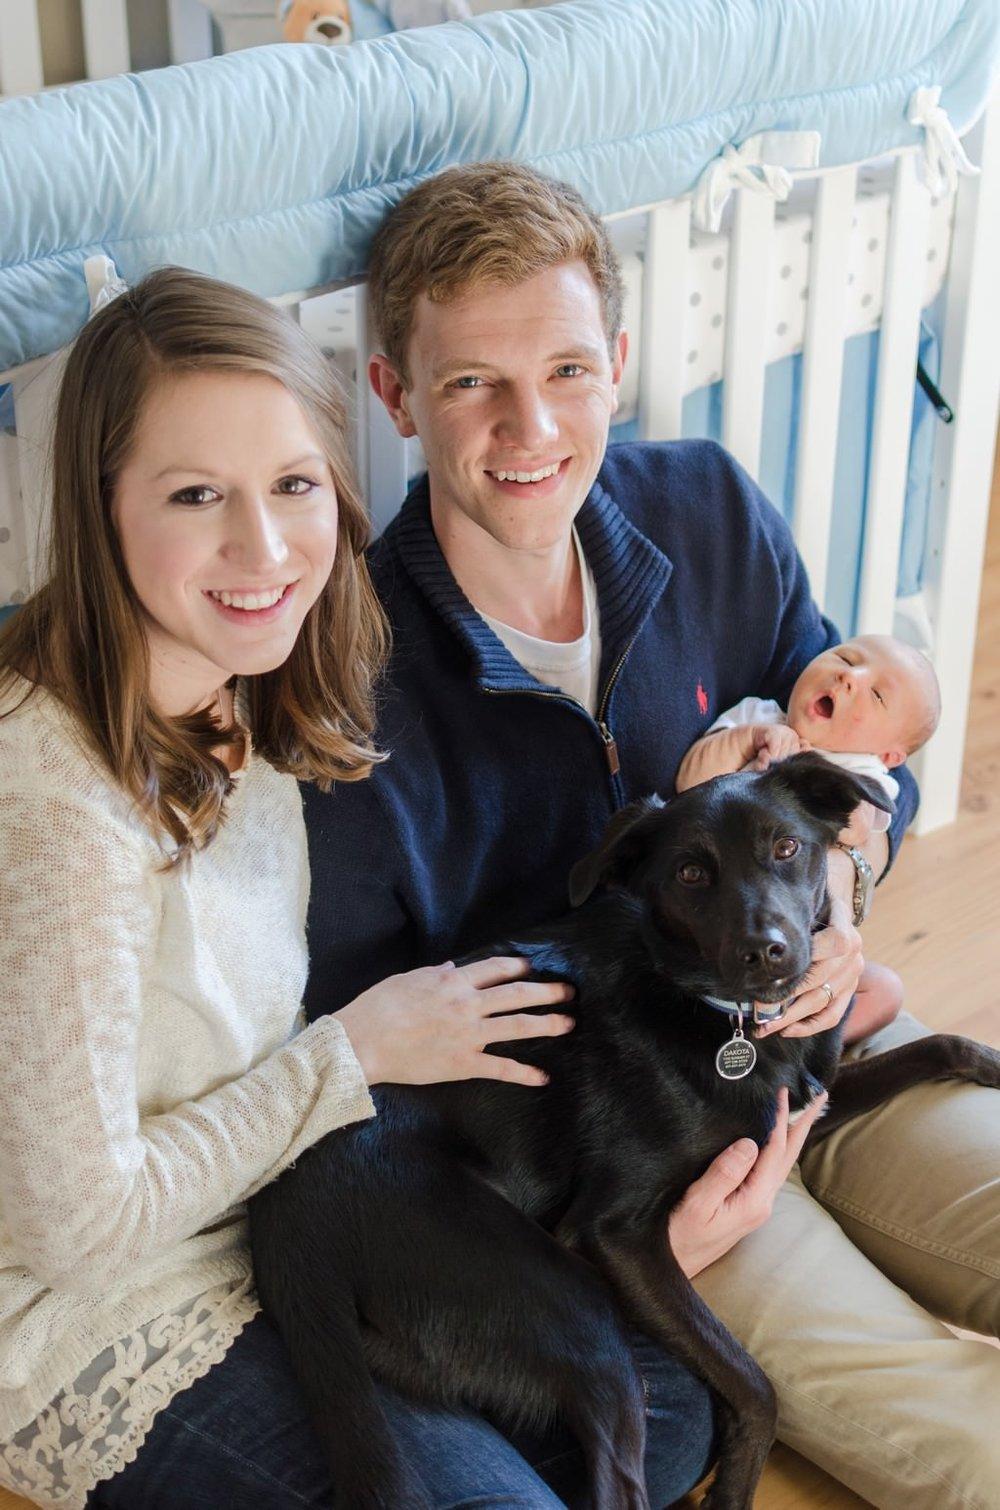 Noah-In-Home-Lifestyle-Newborn-Session-Murfreesboro-Nashville-Photographers+20